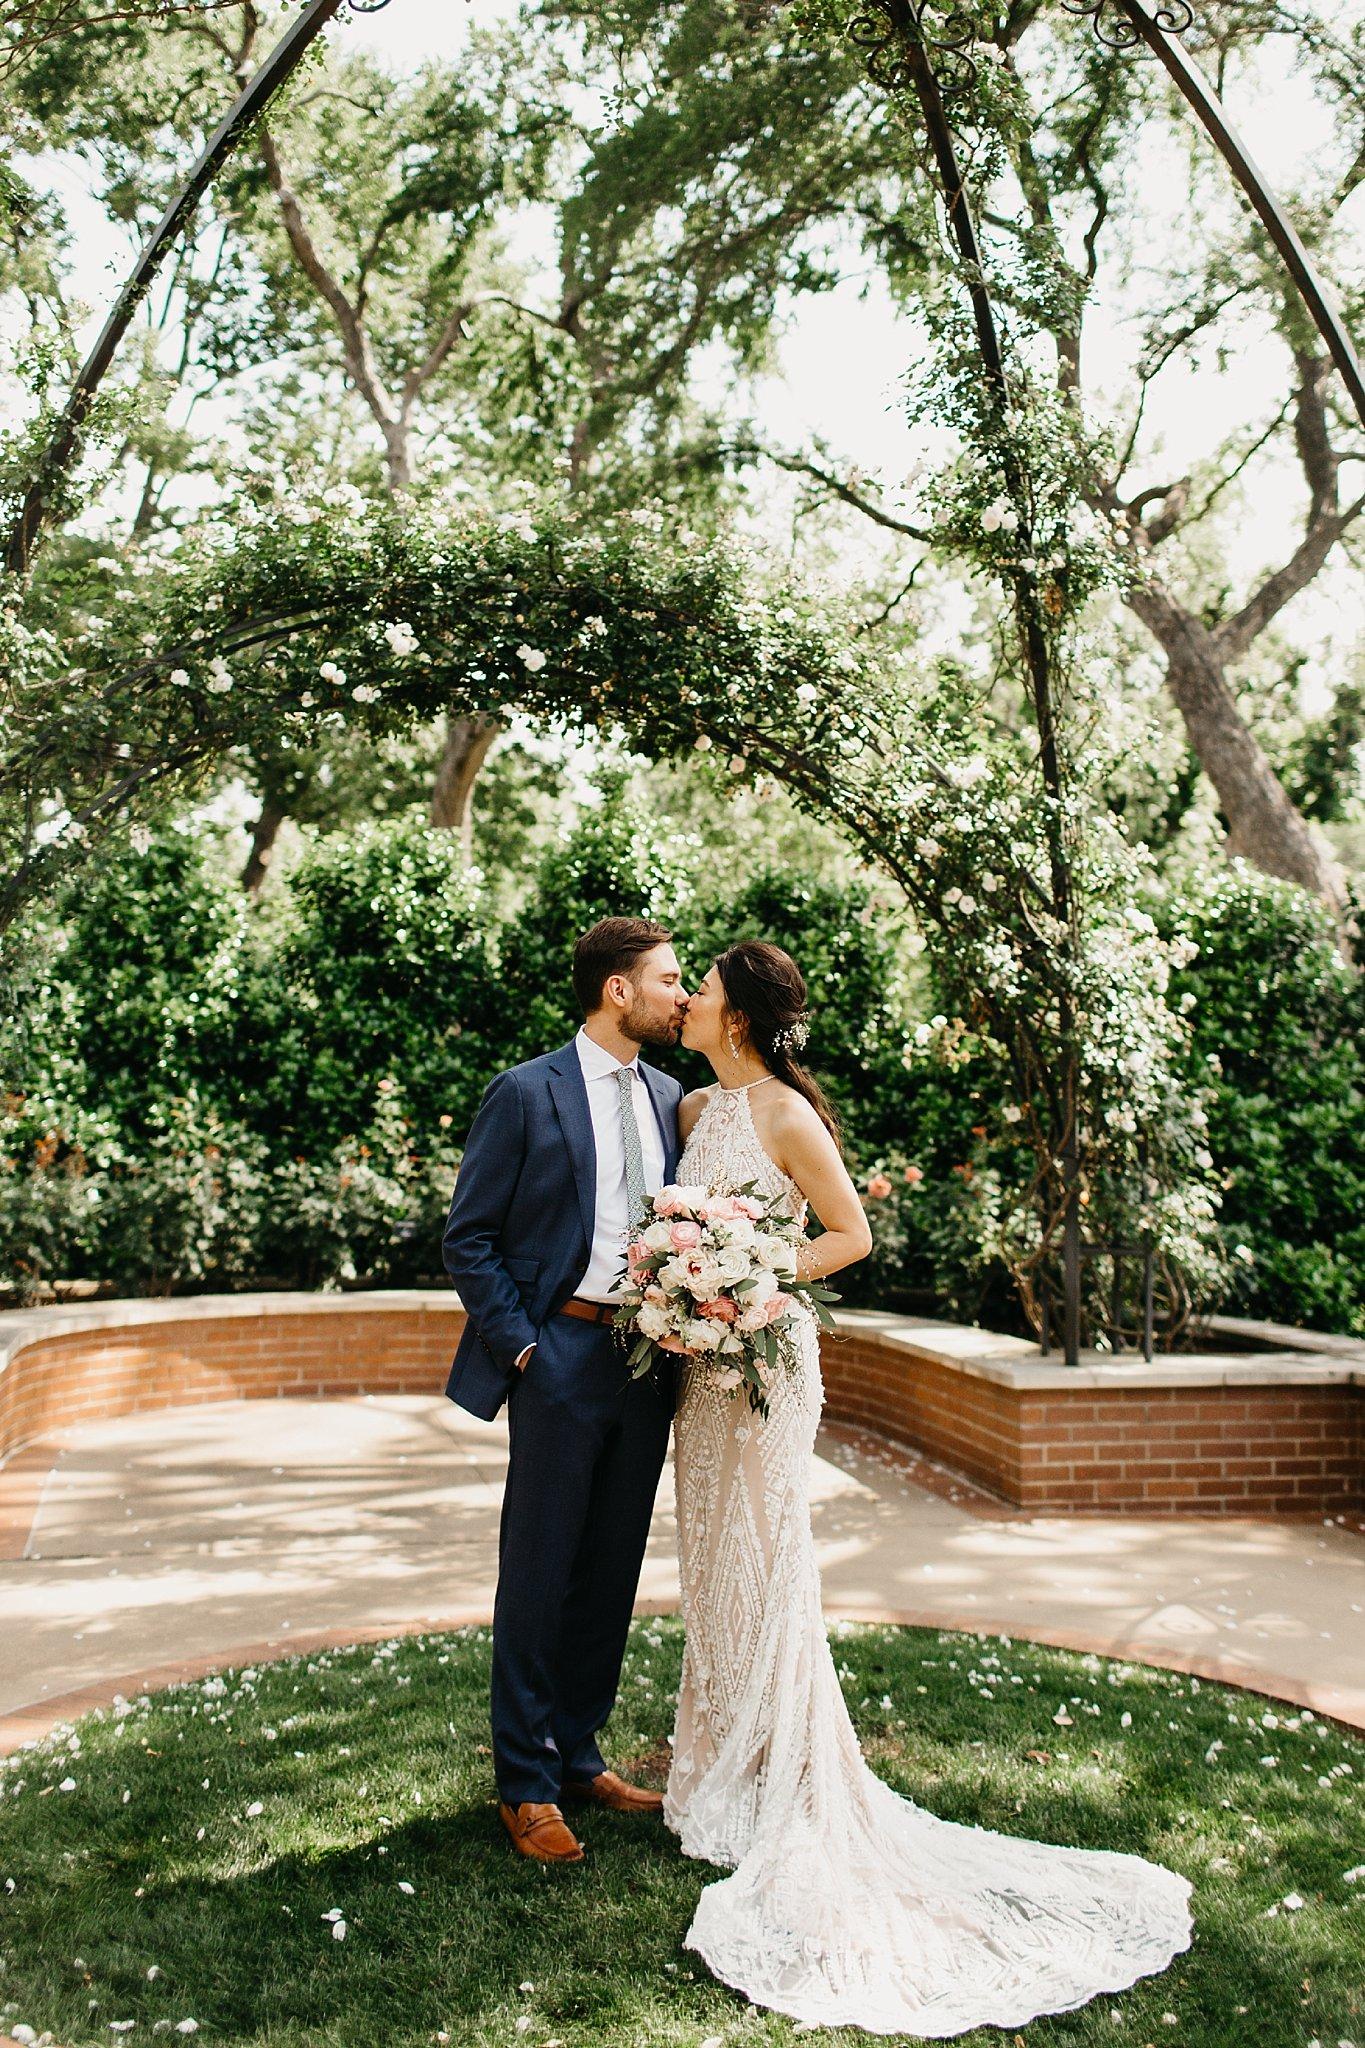 Wilderlove Co_Dallas Texas_Wedding Elopement_Arboretum_Photography_0026.jpg